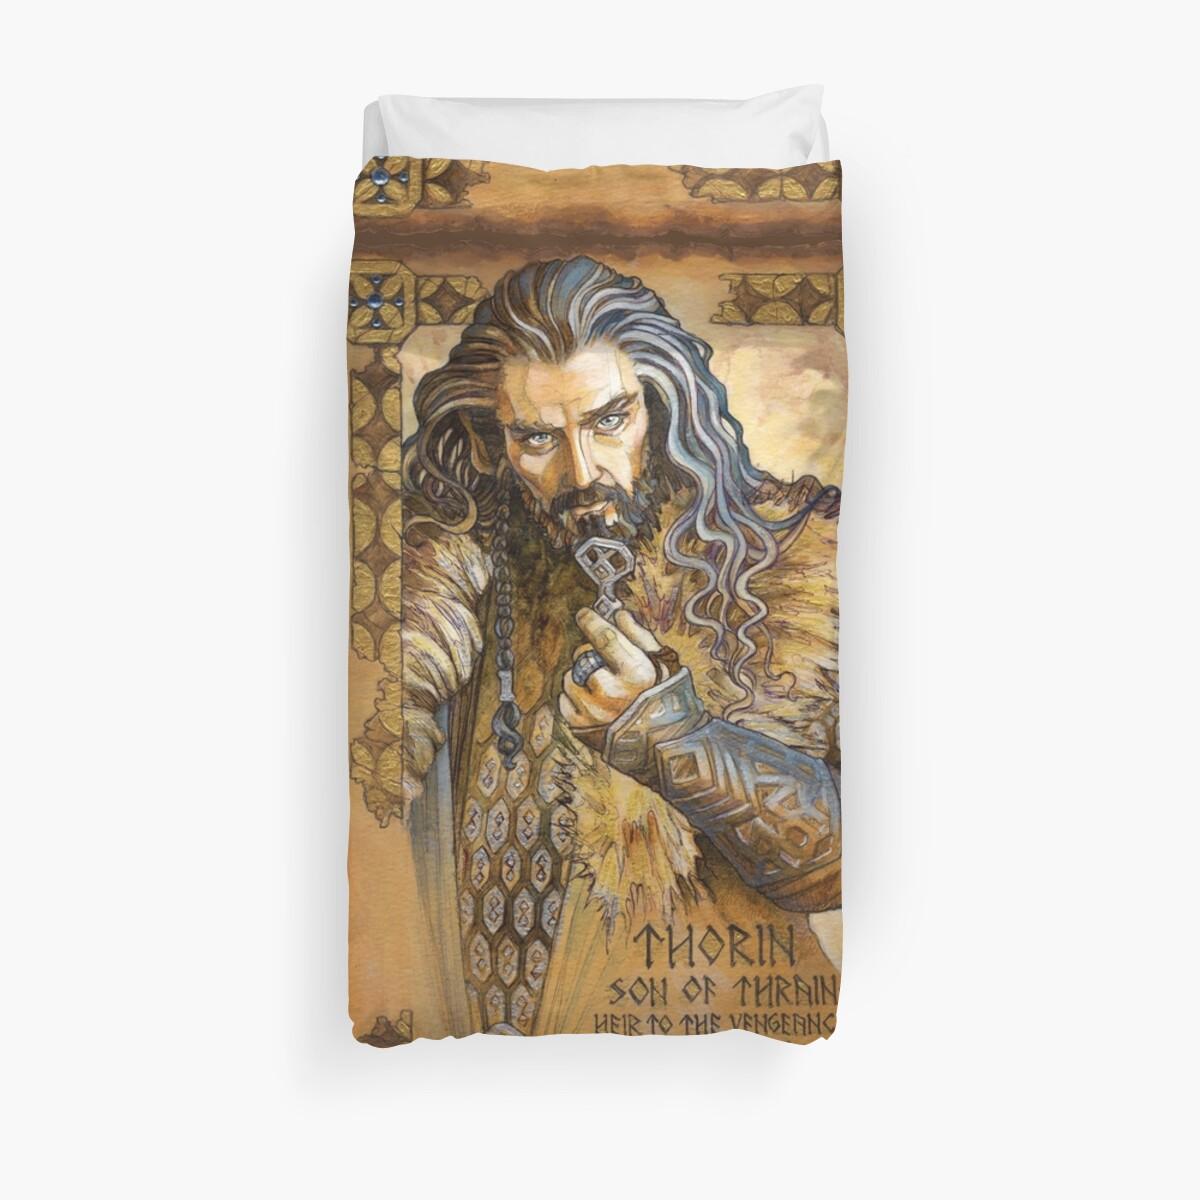 Thorin by BohemianWeasel